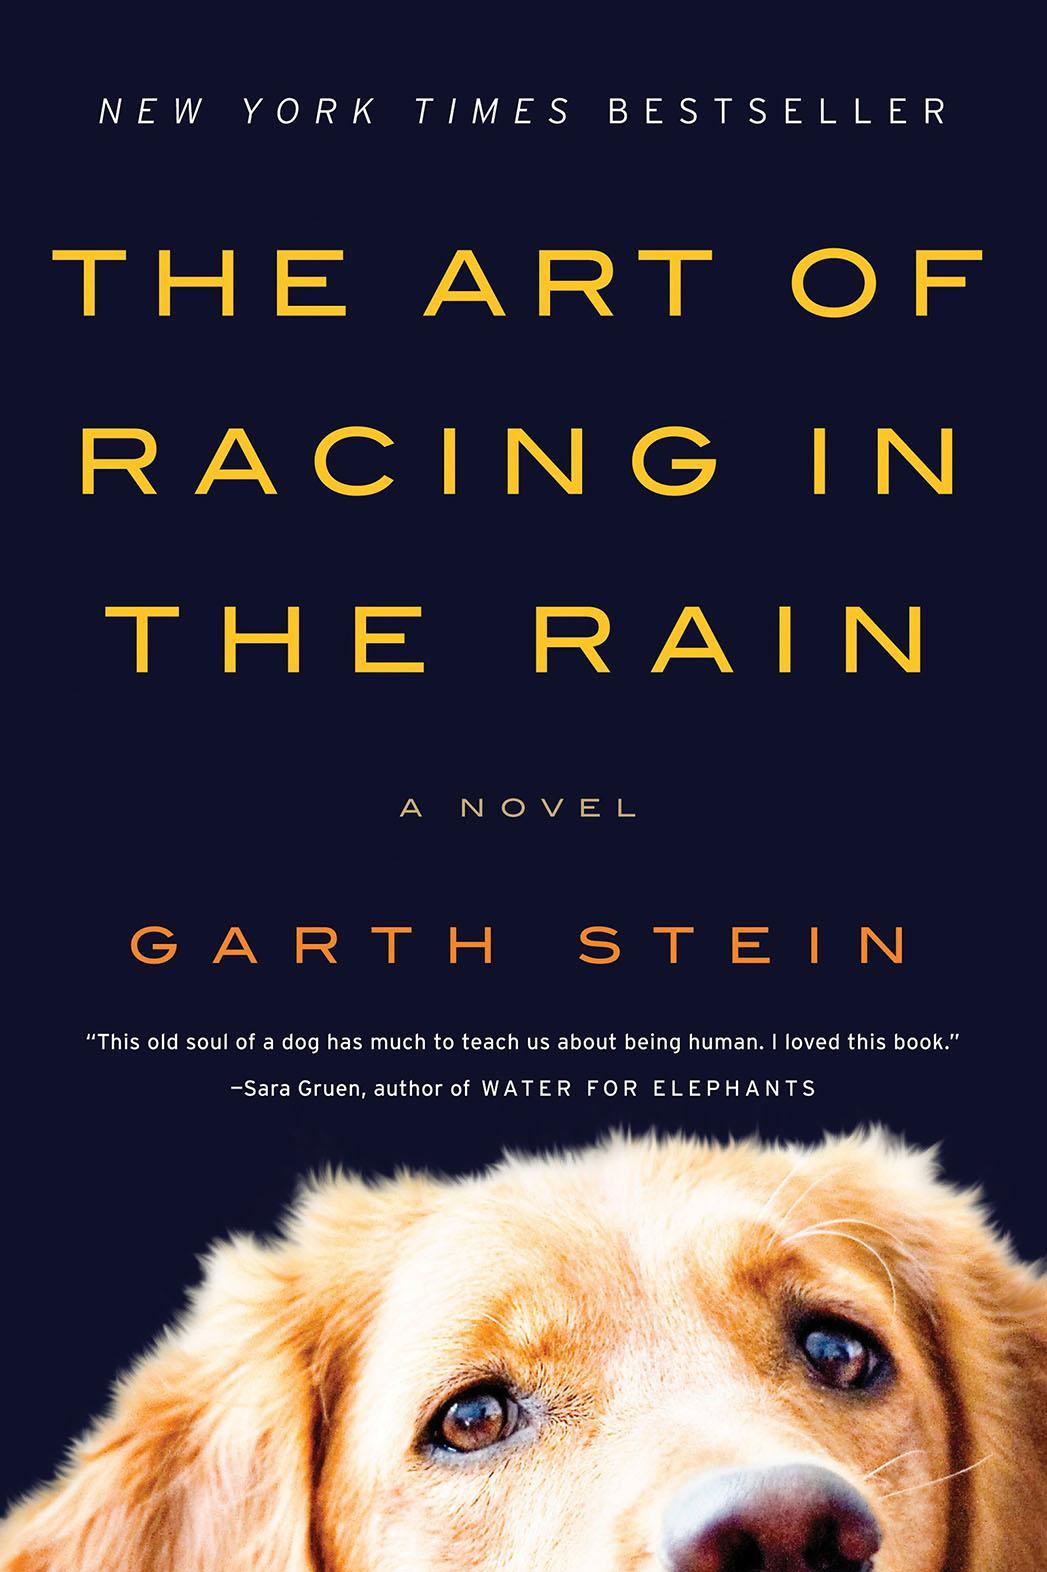 Art of Racing in the Rain Cover - P 2016